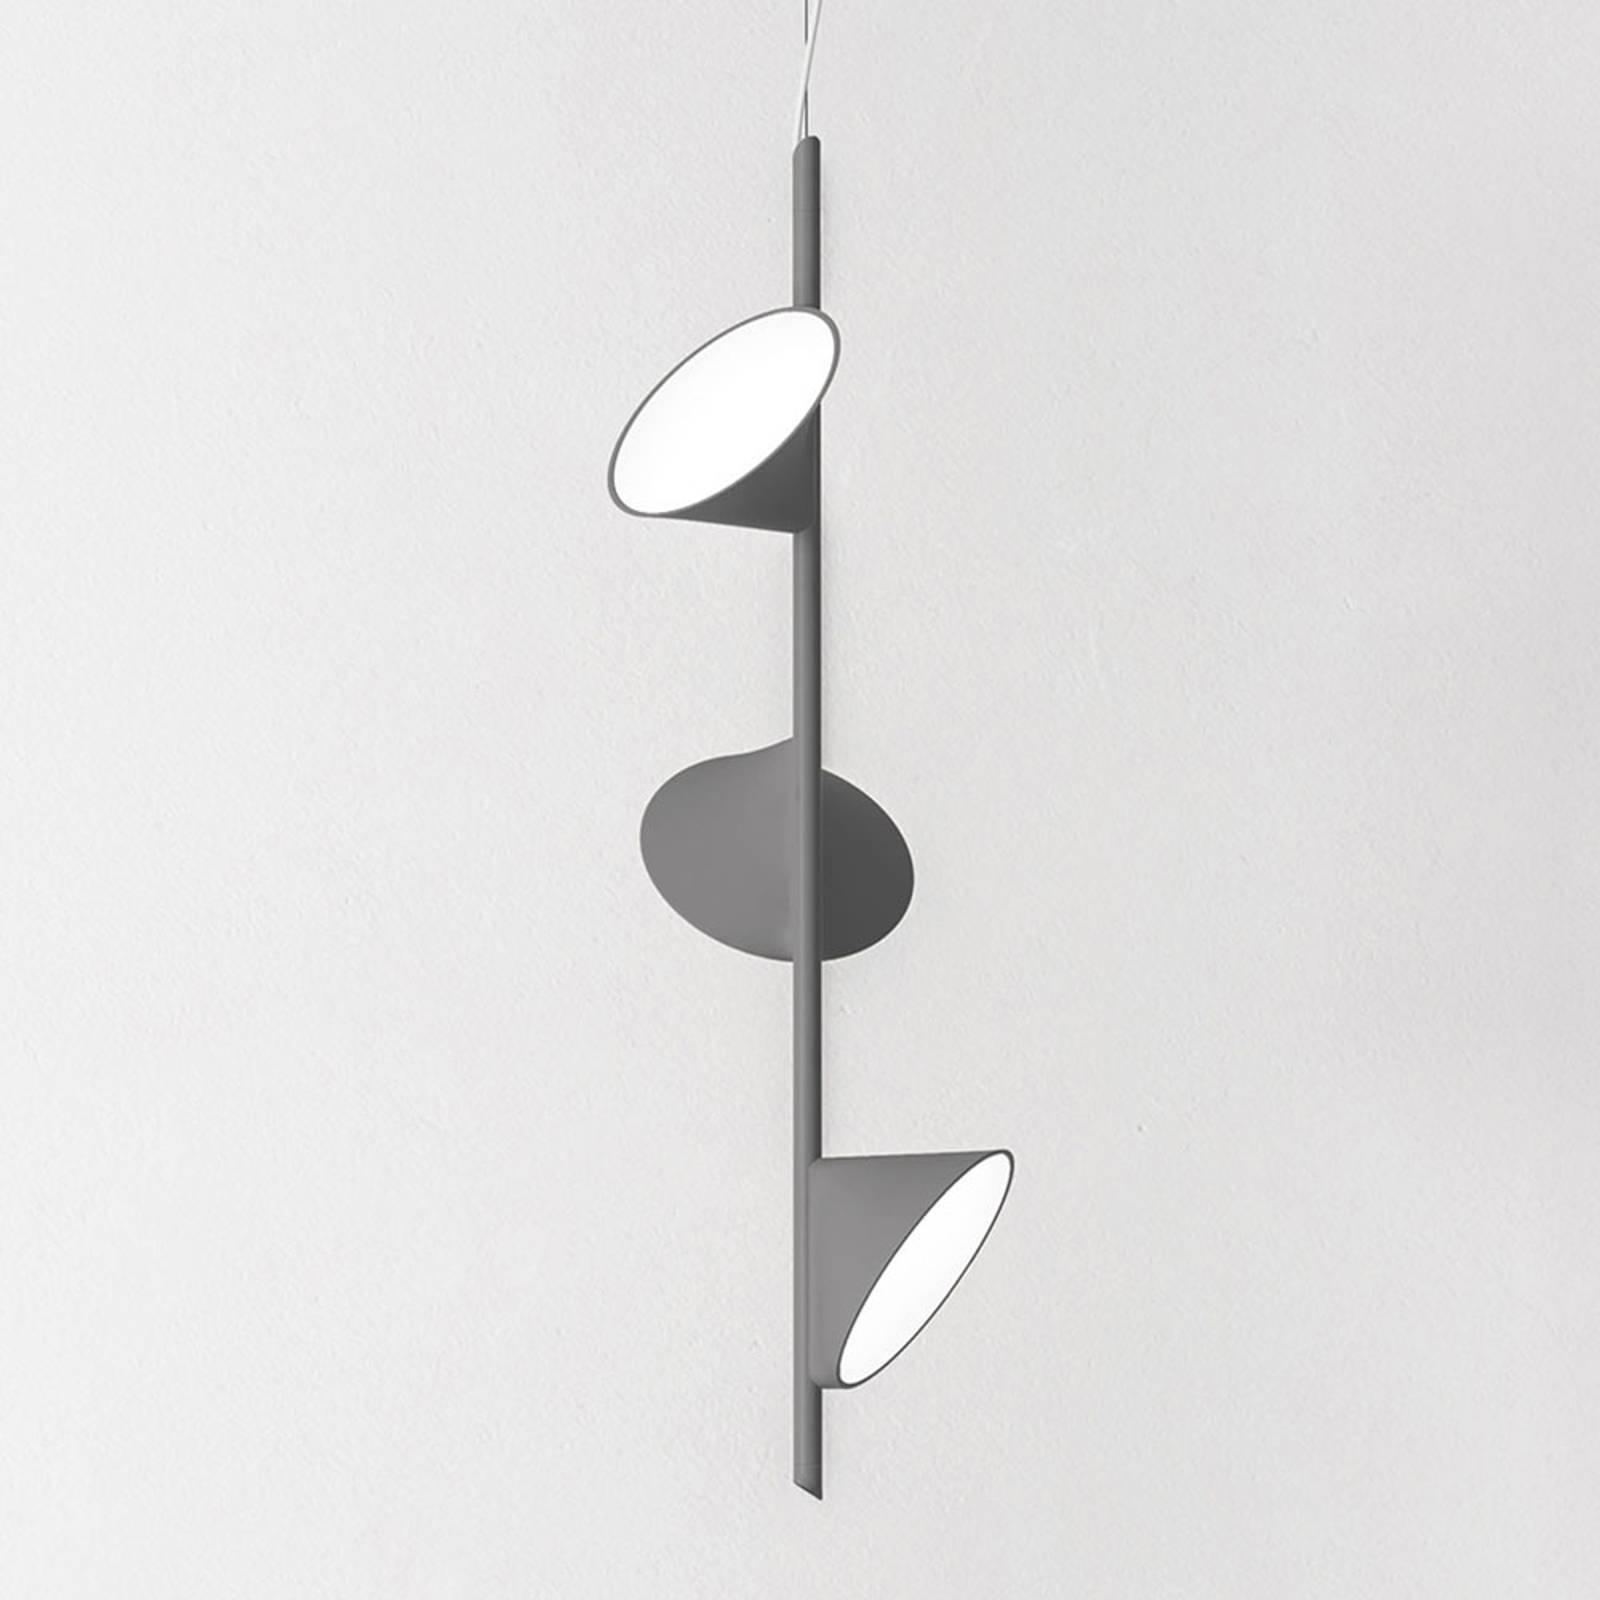 Axolight Orchid lampa wisząca LED 3-pkt. szara